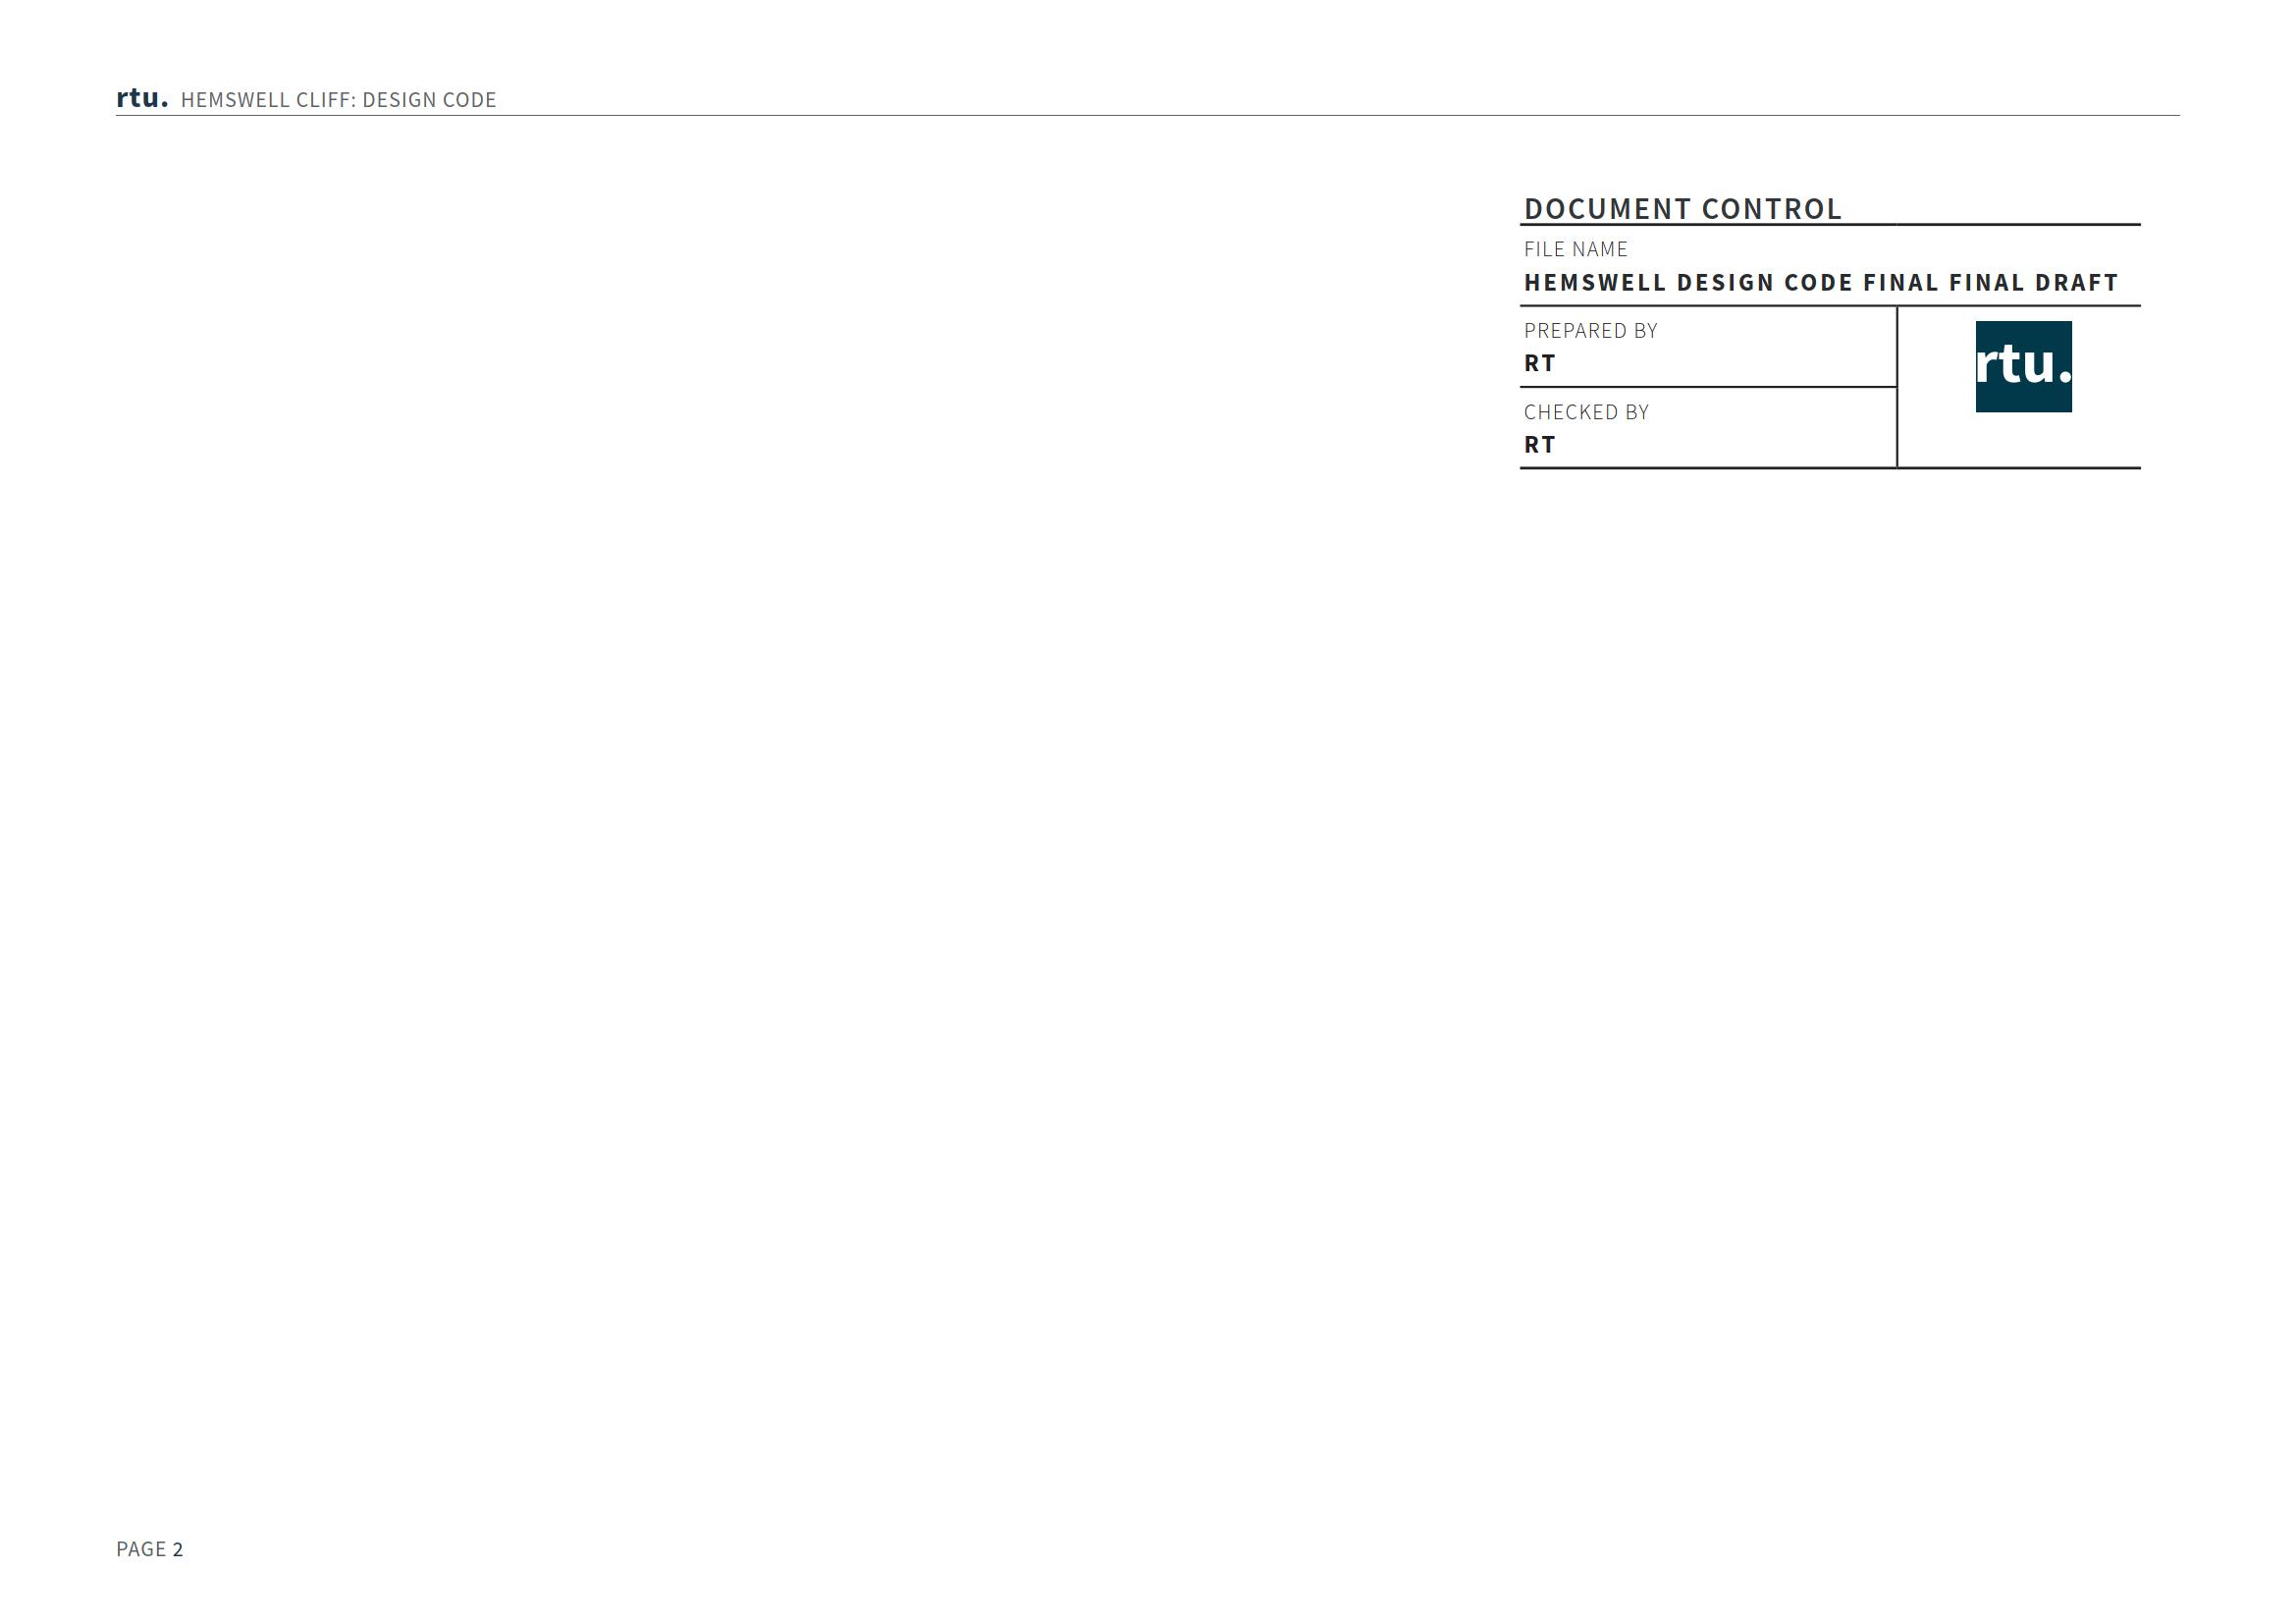 Hemswell_Cliff_Design_Code_final_02.png